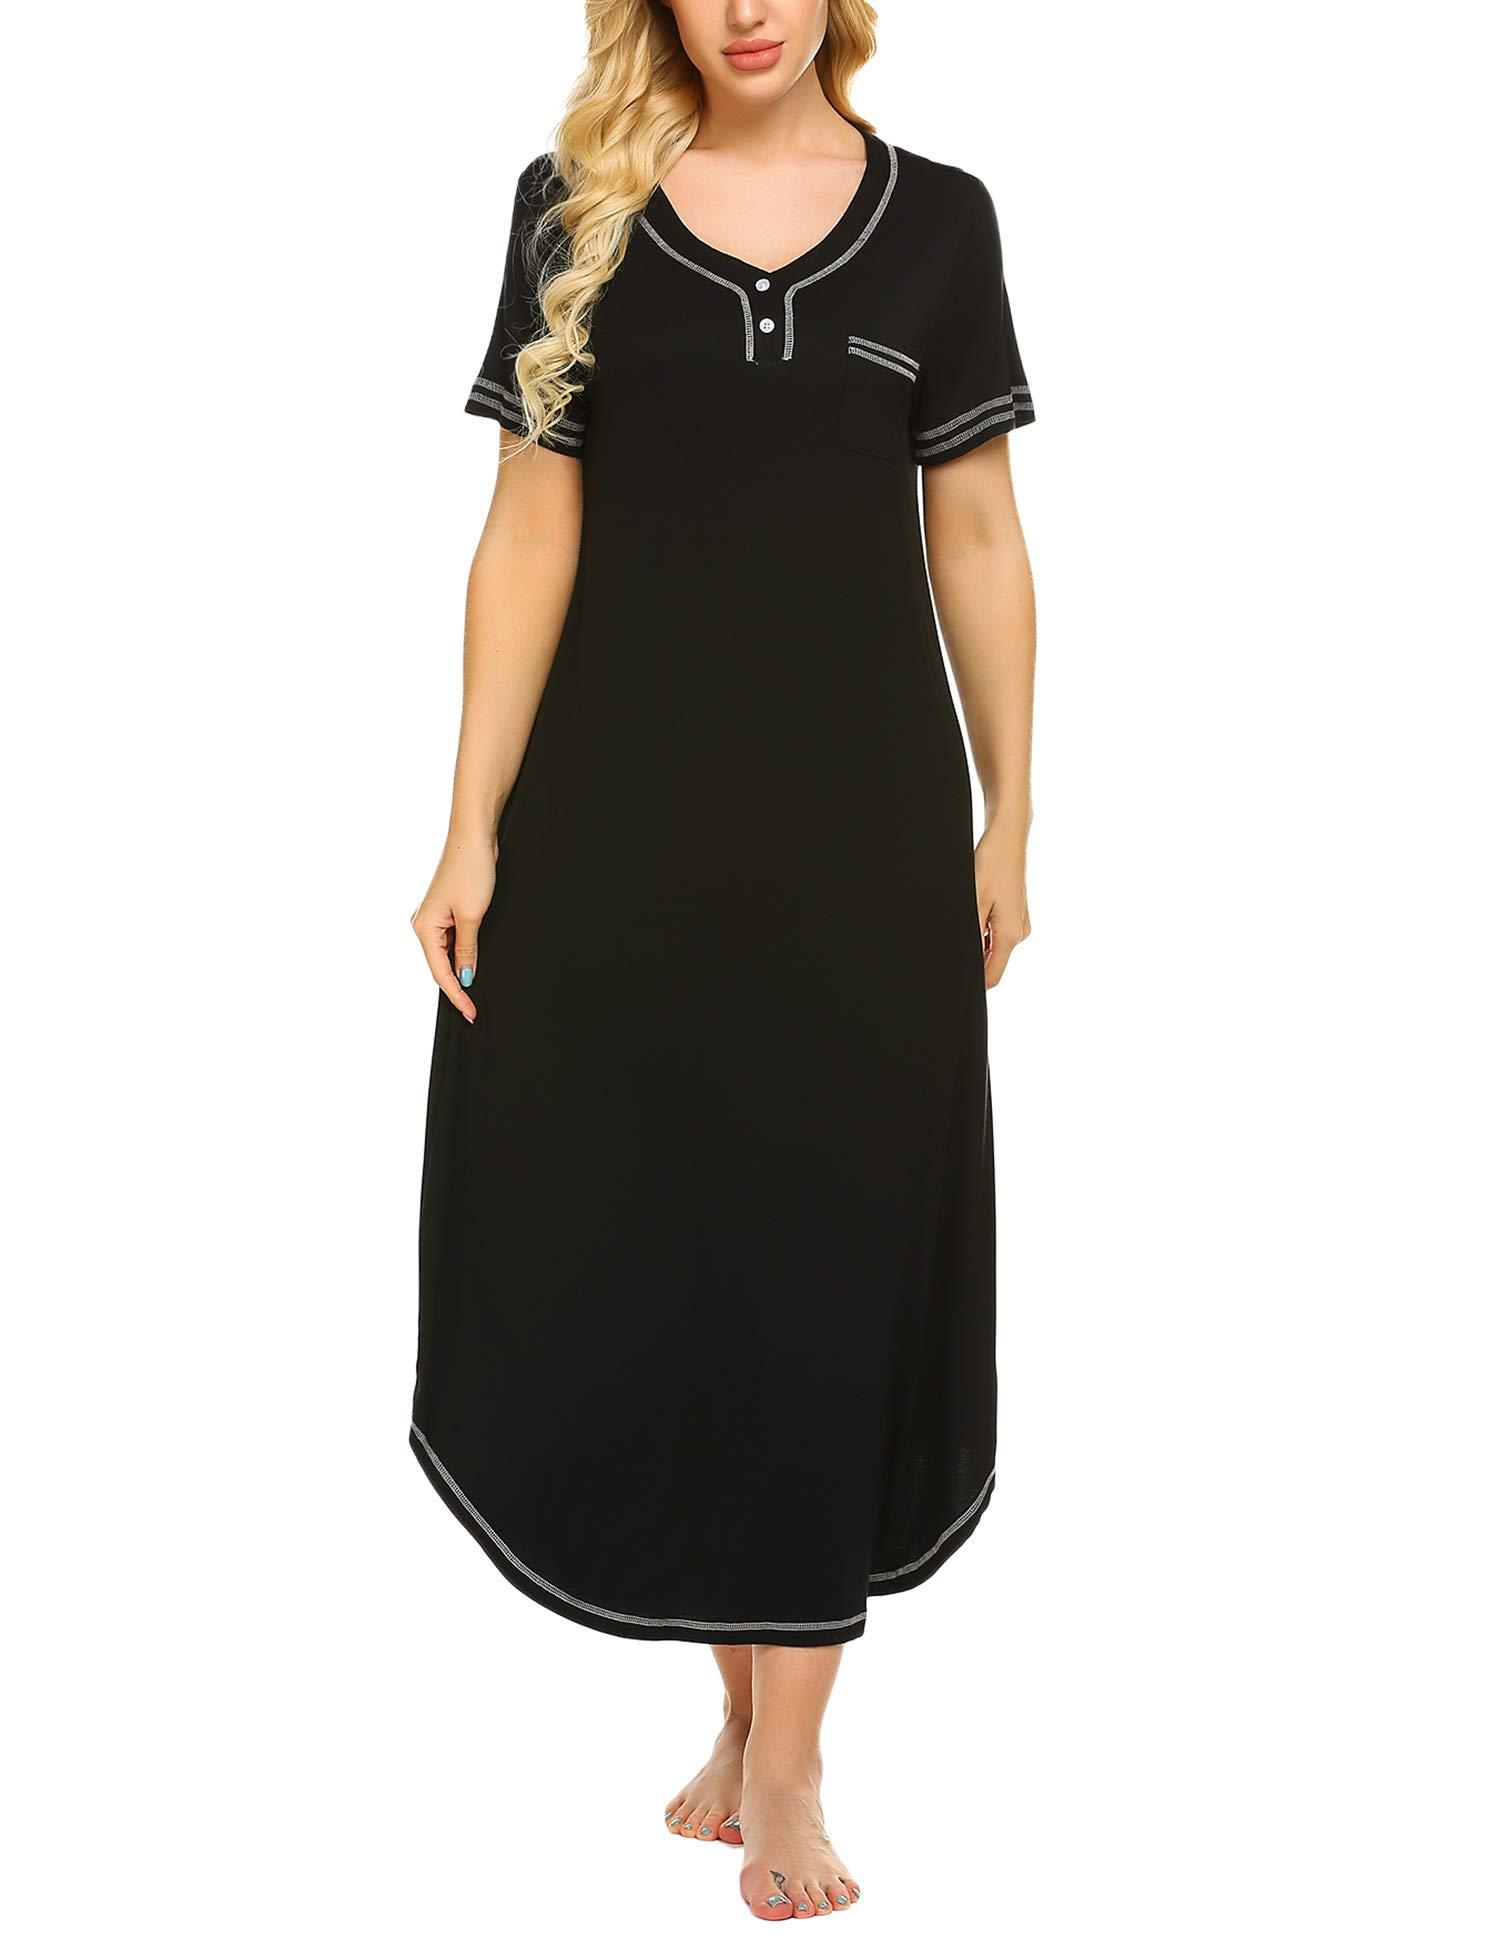 Ekouaer V Neck Sleepshirts Women Cotton Short Sleeve Nighty Maxi Dress Nightgown Pocket (Black, X-Large)